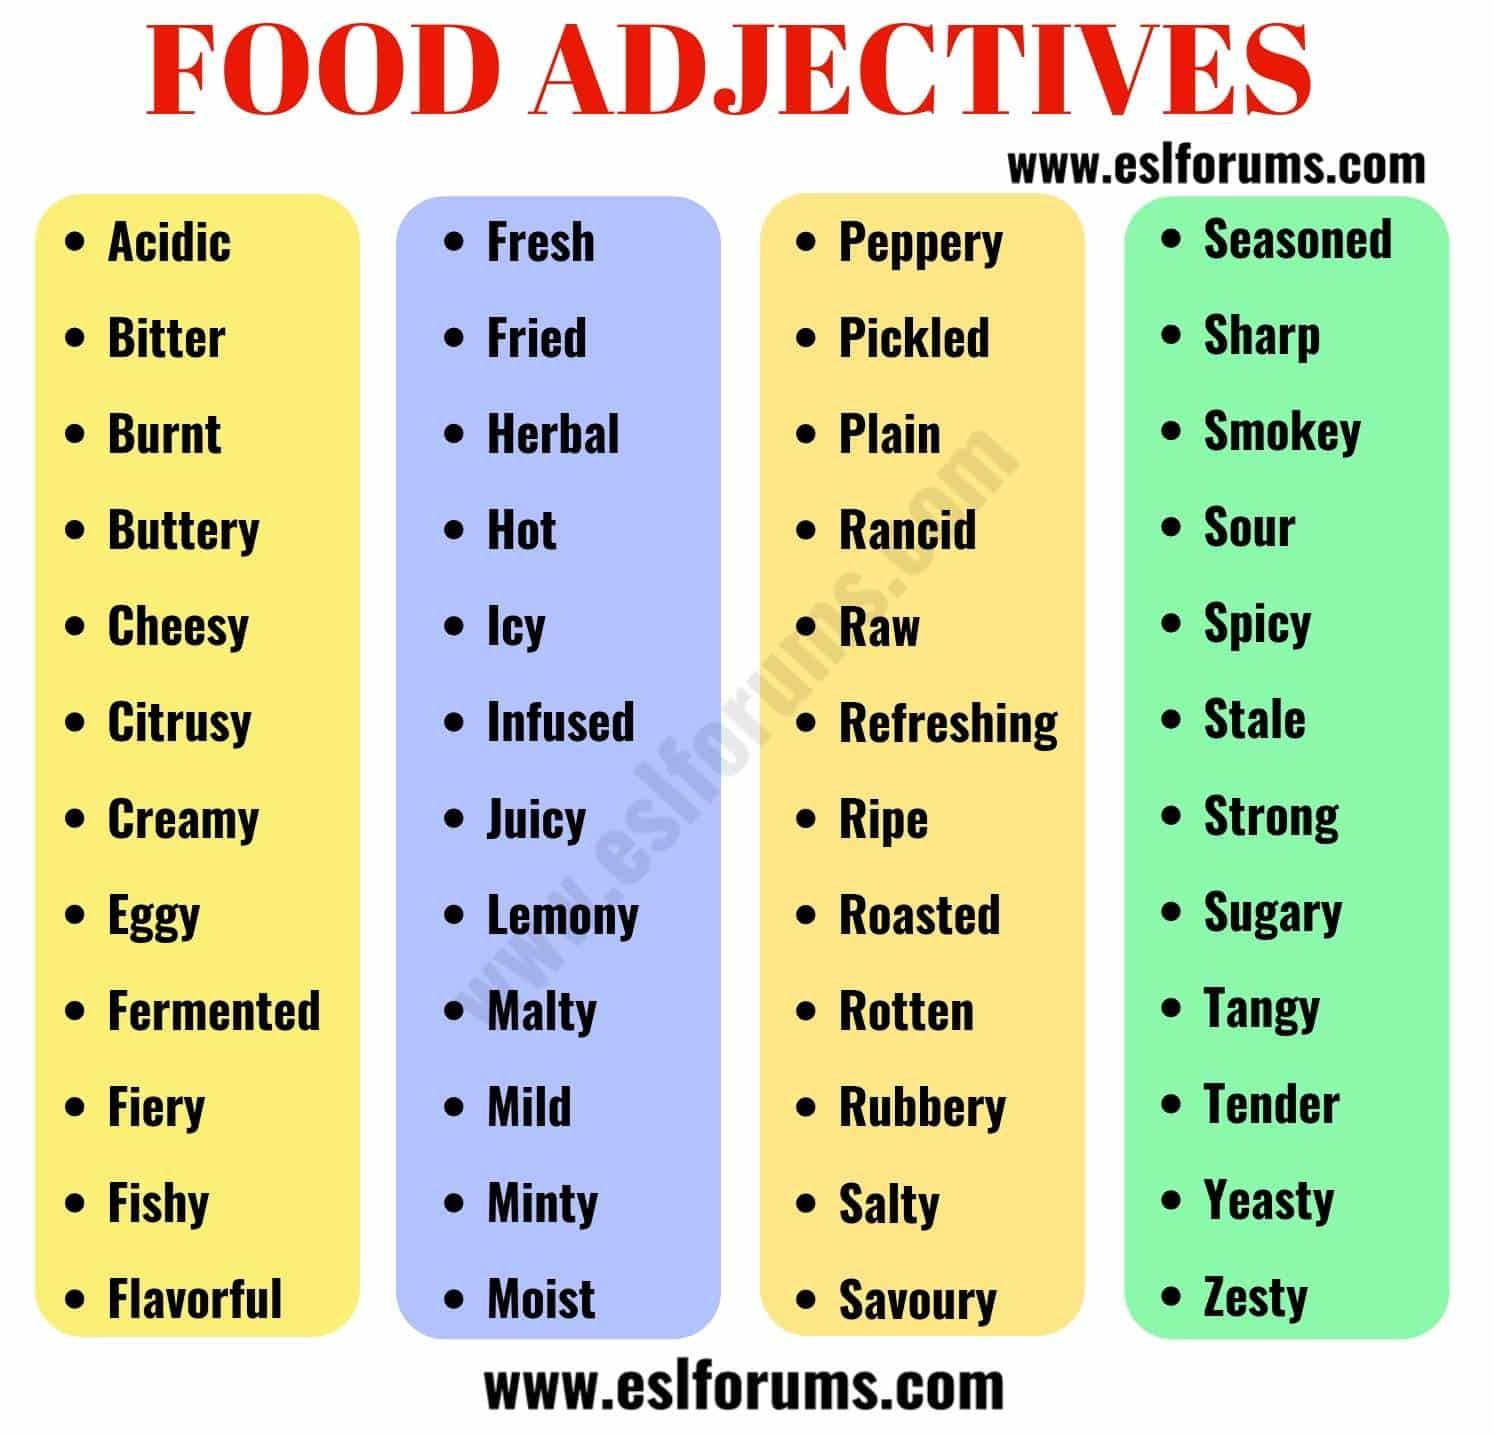 Food Adjectives 48 Useful Adjectives To Describe Food